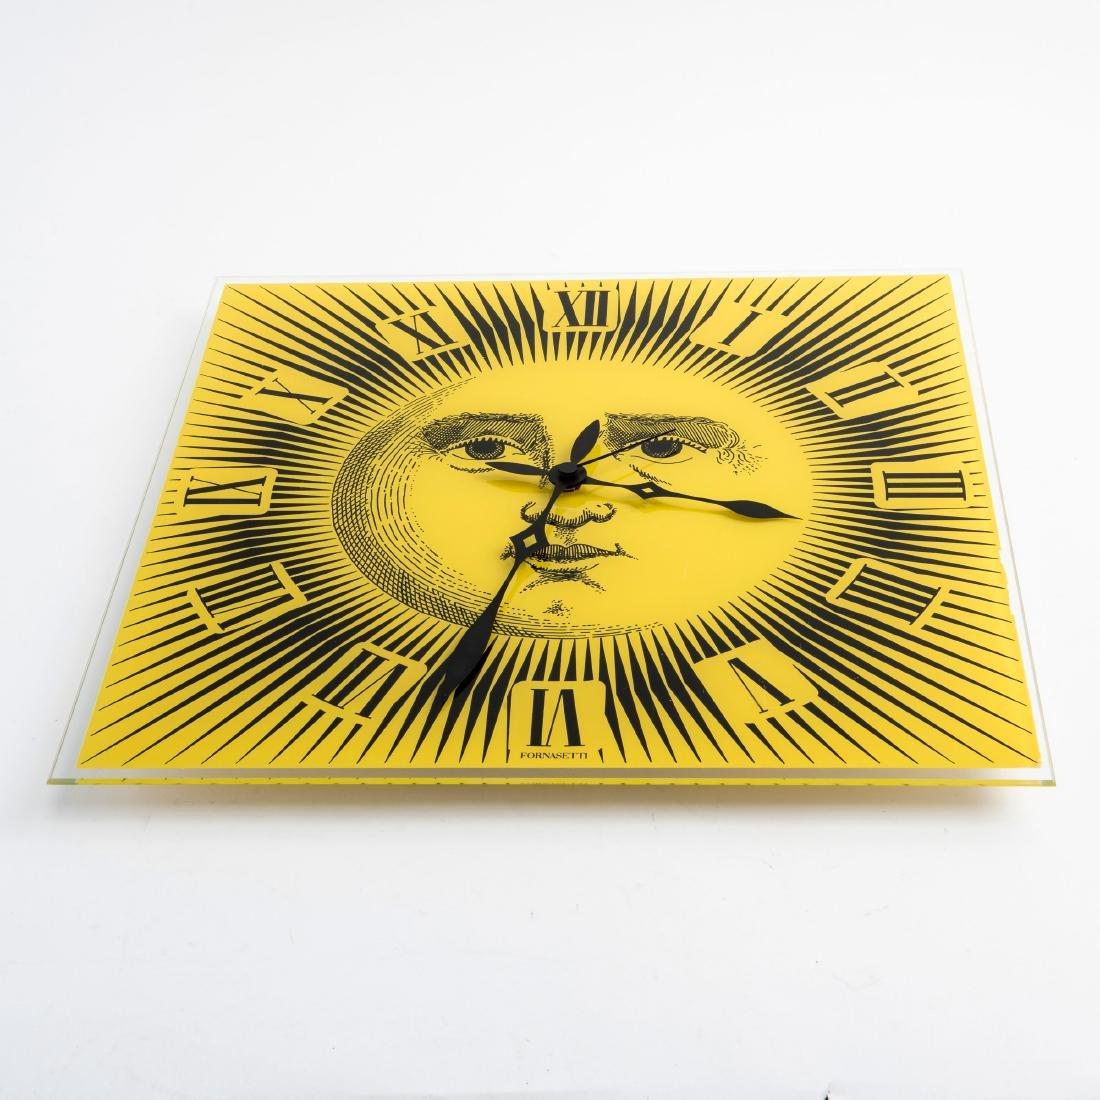 'Sole' clock, 1990s - 2